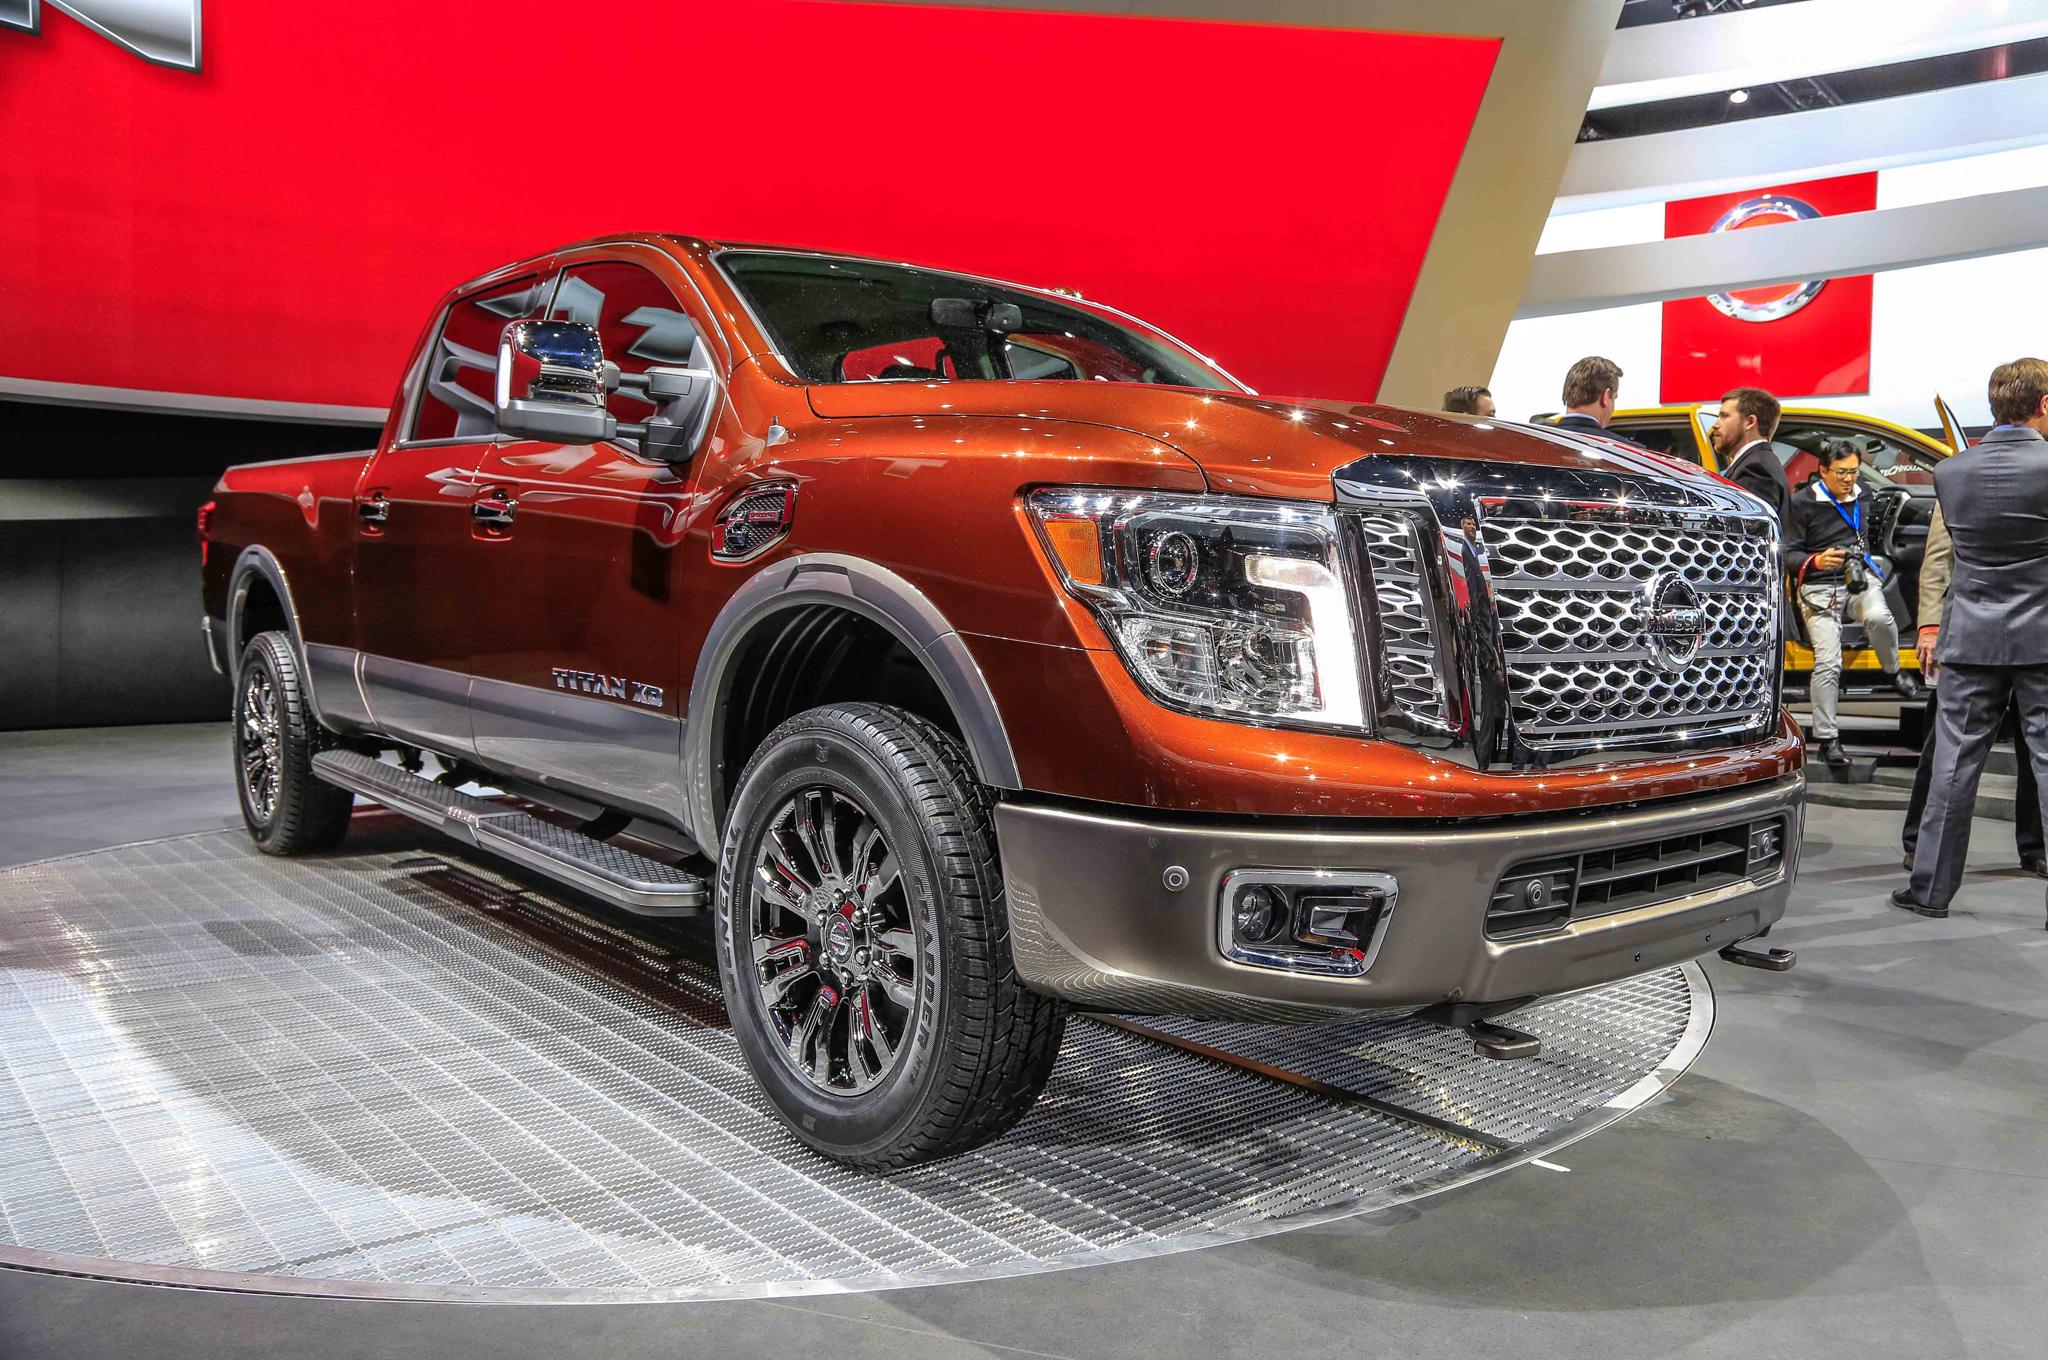 2016 Nissan Titan Exterior Preview